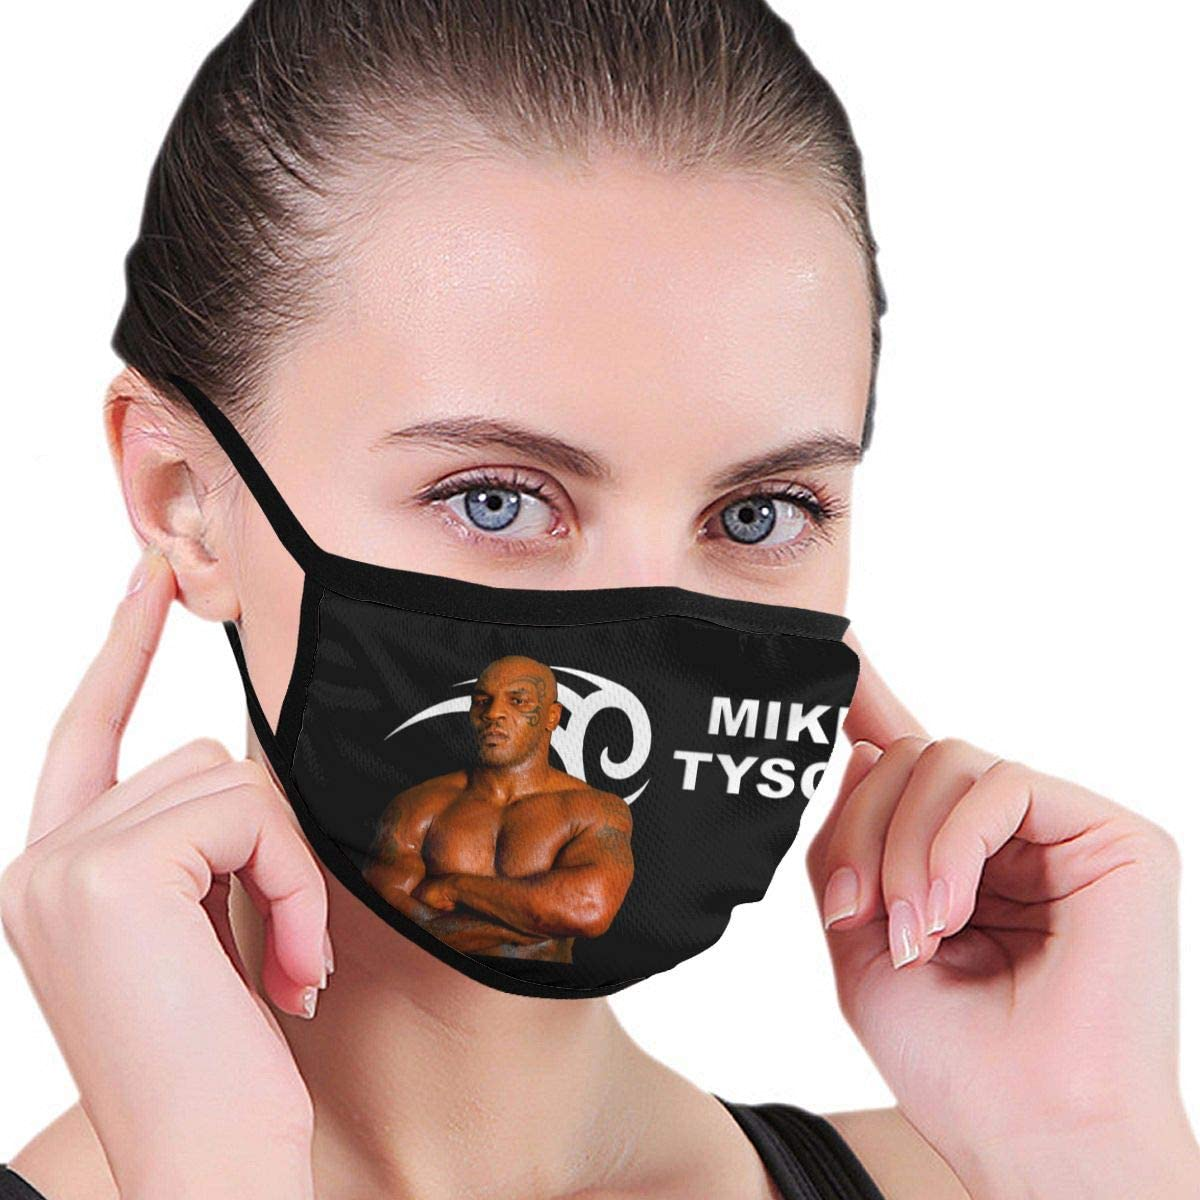 Qwtykeertyi Mike Tyson Fashion Protective Reusable Unisex Black Cotton Washable Balaclava